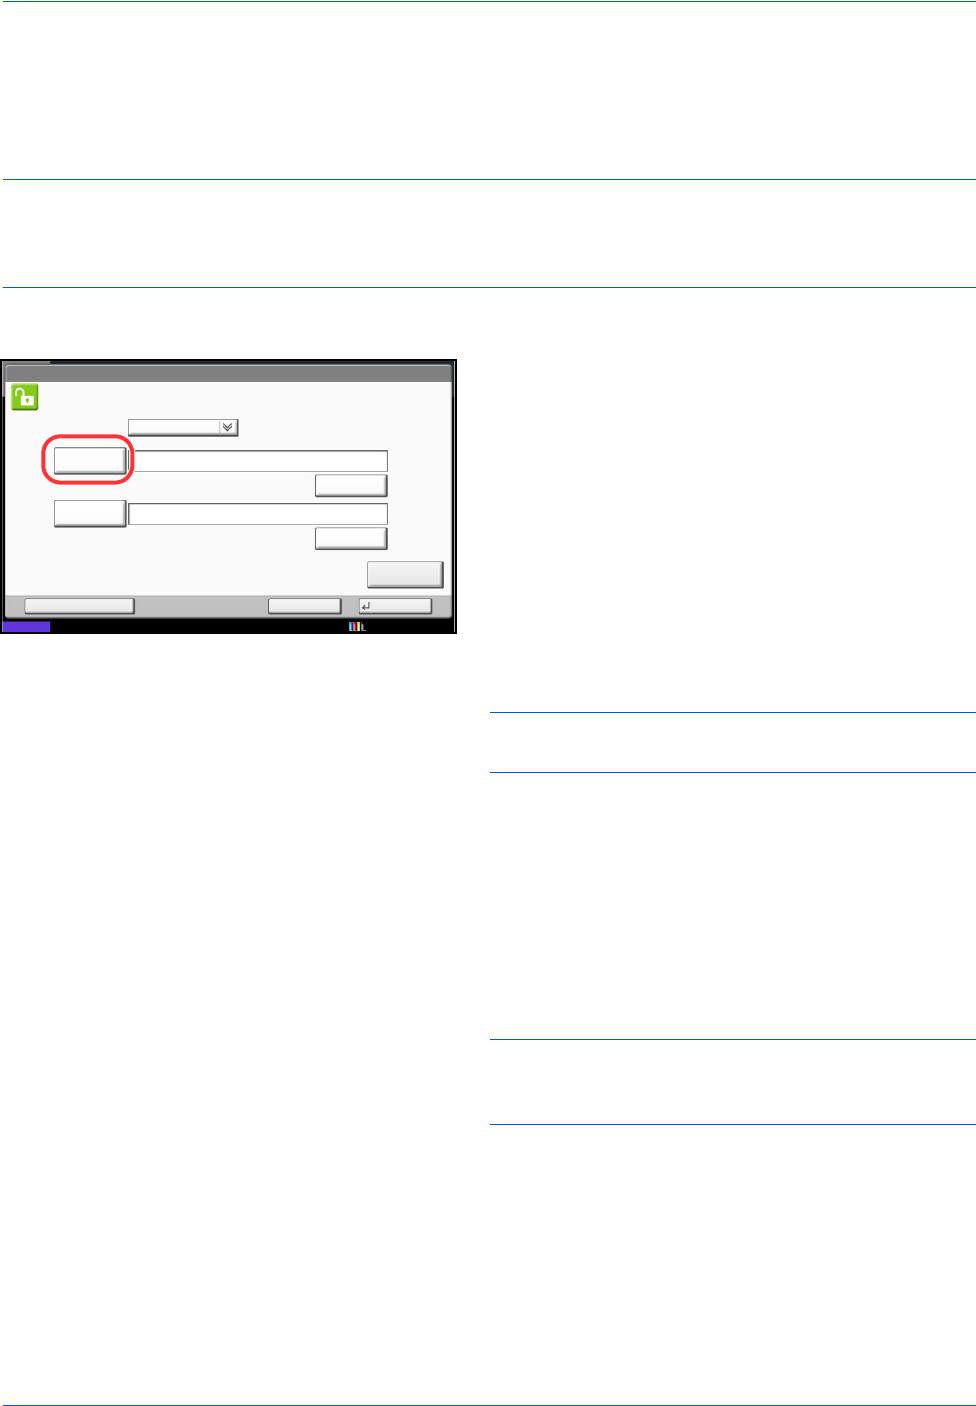 Kyocera 3550ci User Manual To The 48a0b825 2267 470e 9b3d